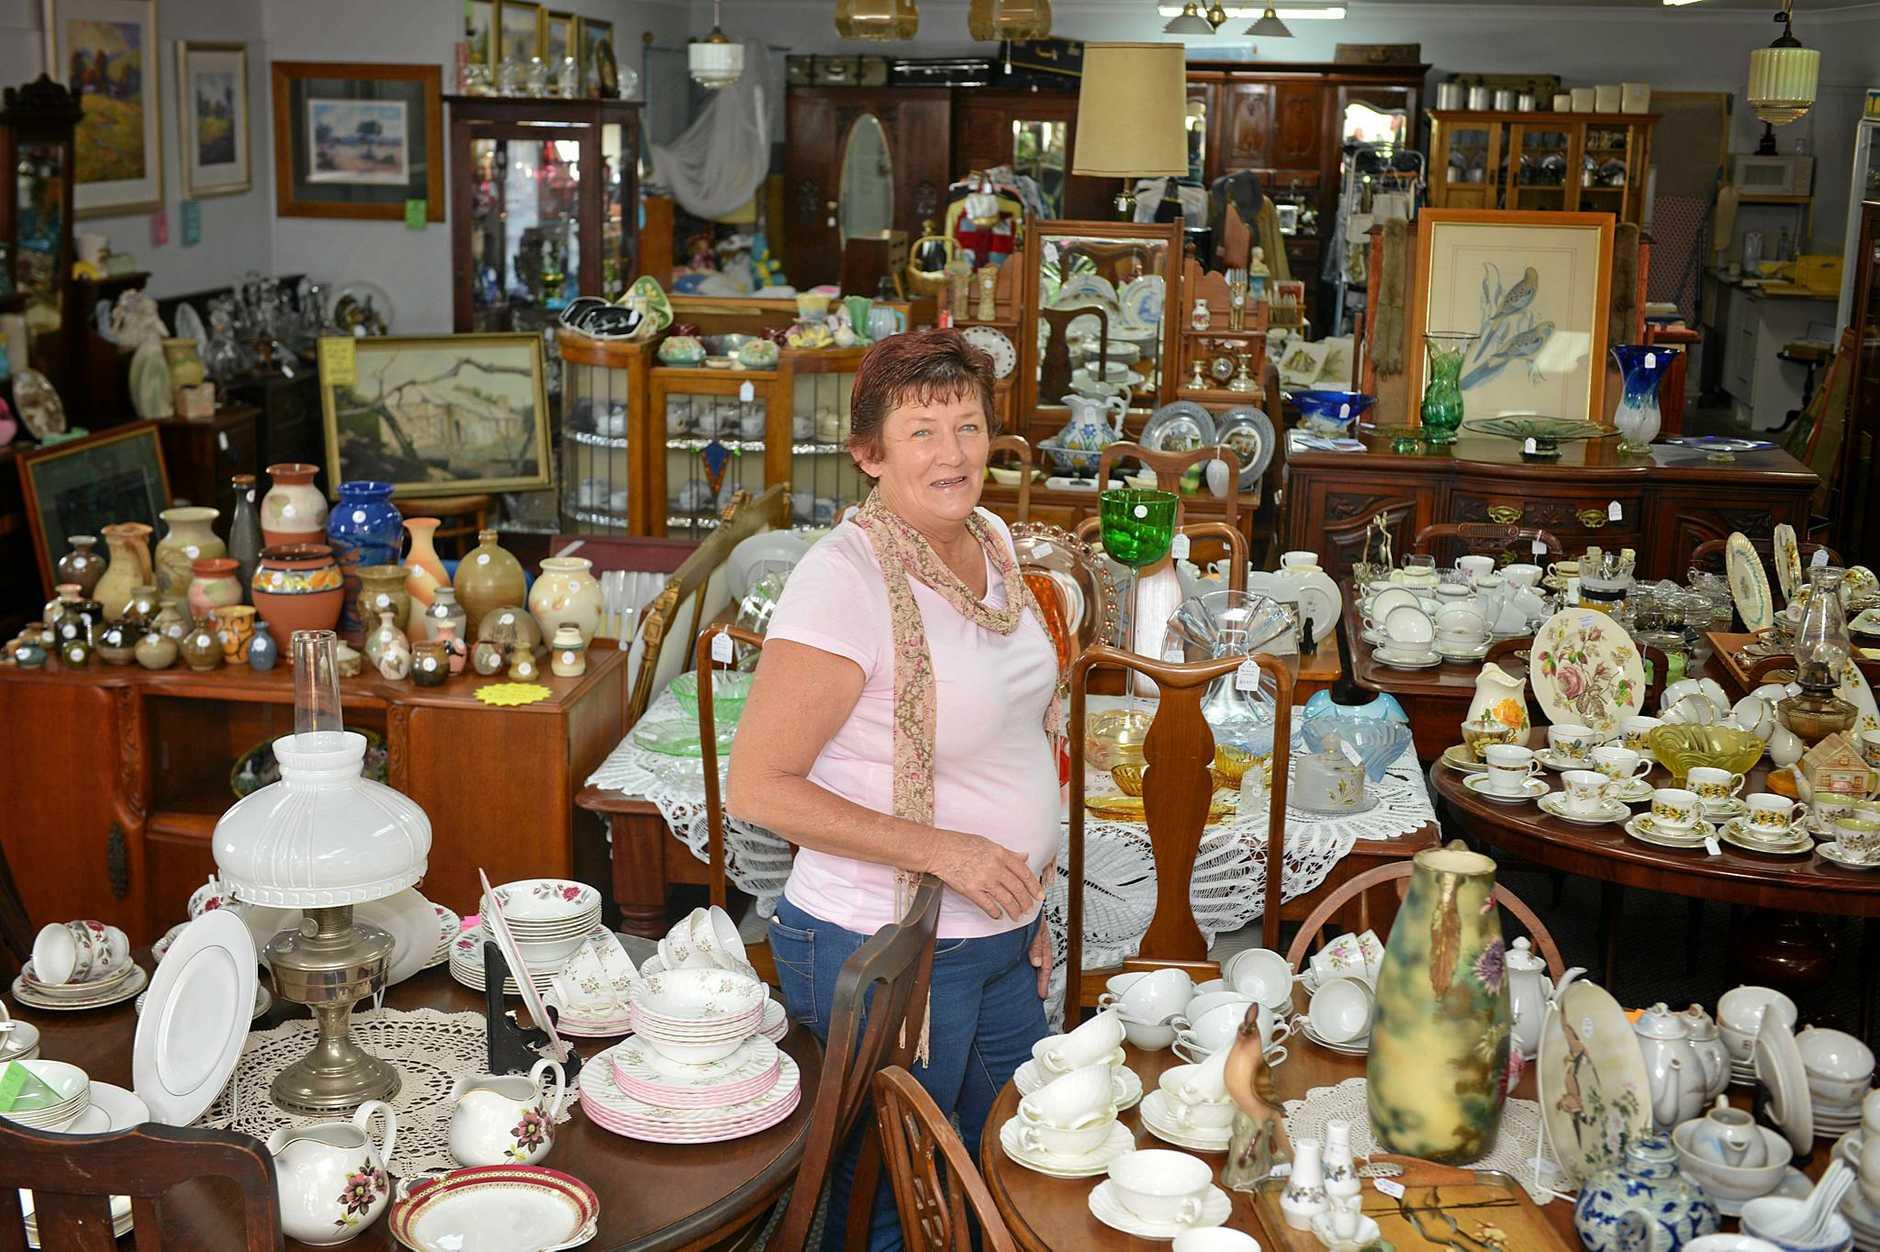 Chris Jepcott loves working at Kilkivan Fine Art & Antiques in Gympie.